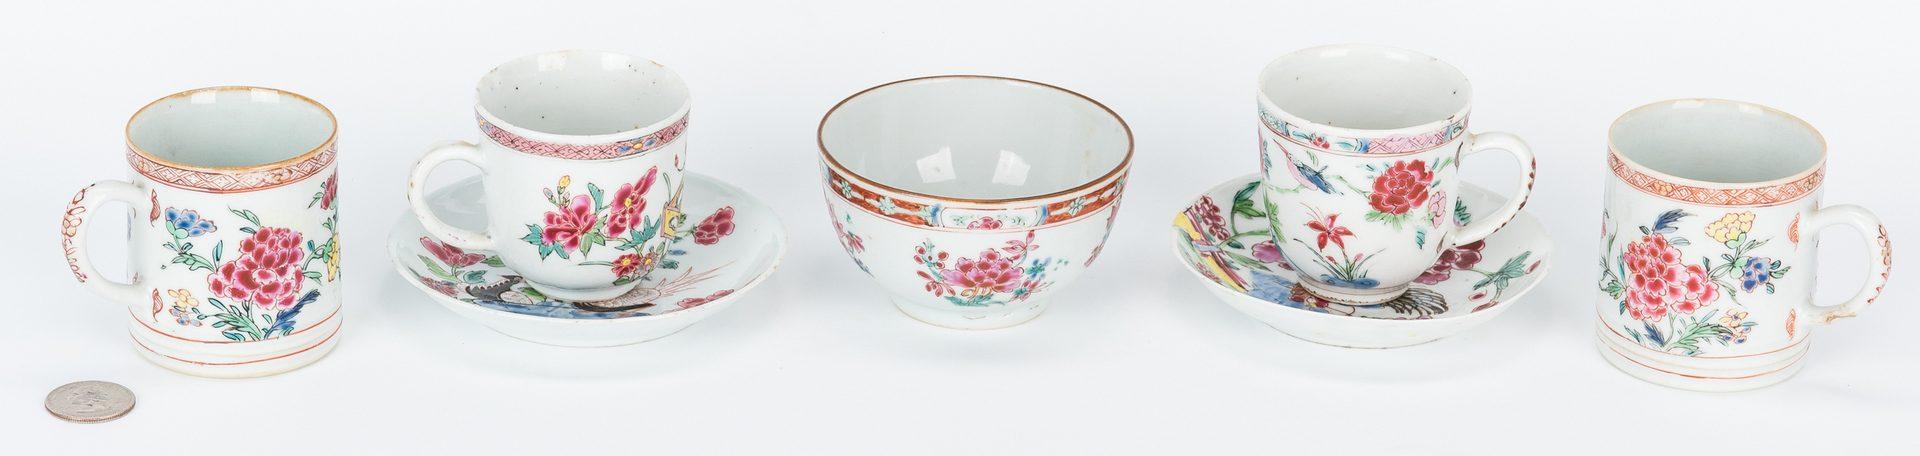 Lot 21: 7 Famille Rose Porcelain Tea Cups, Saucers